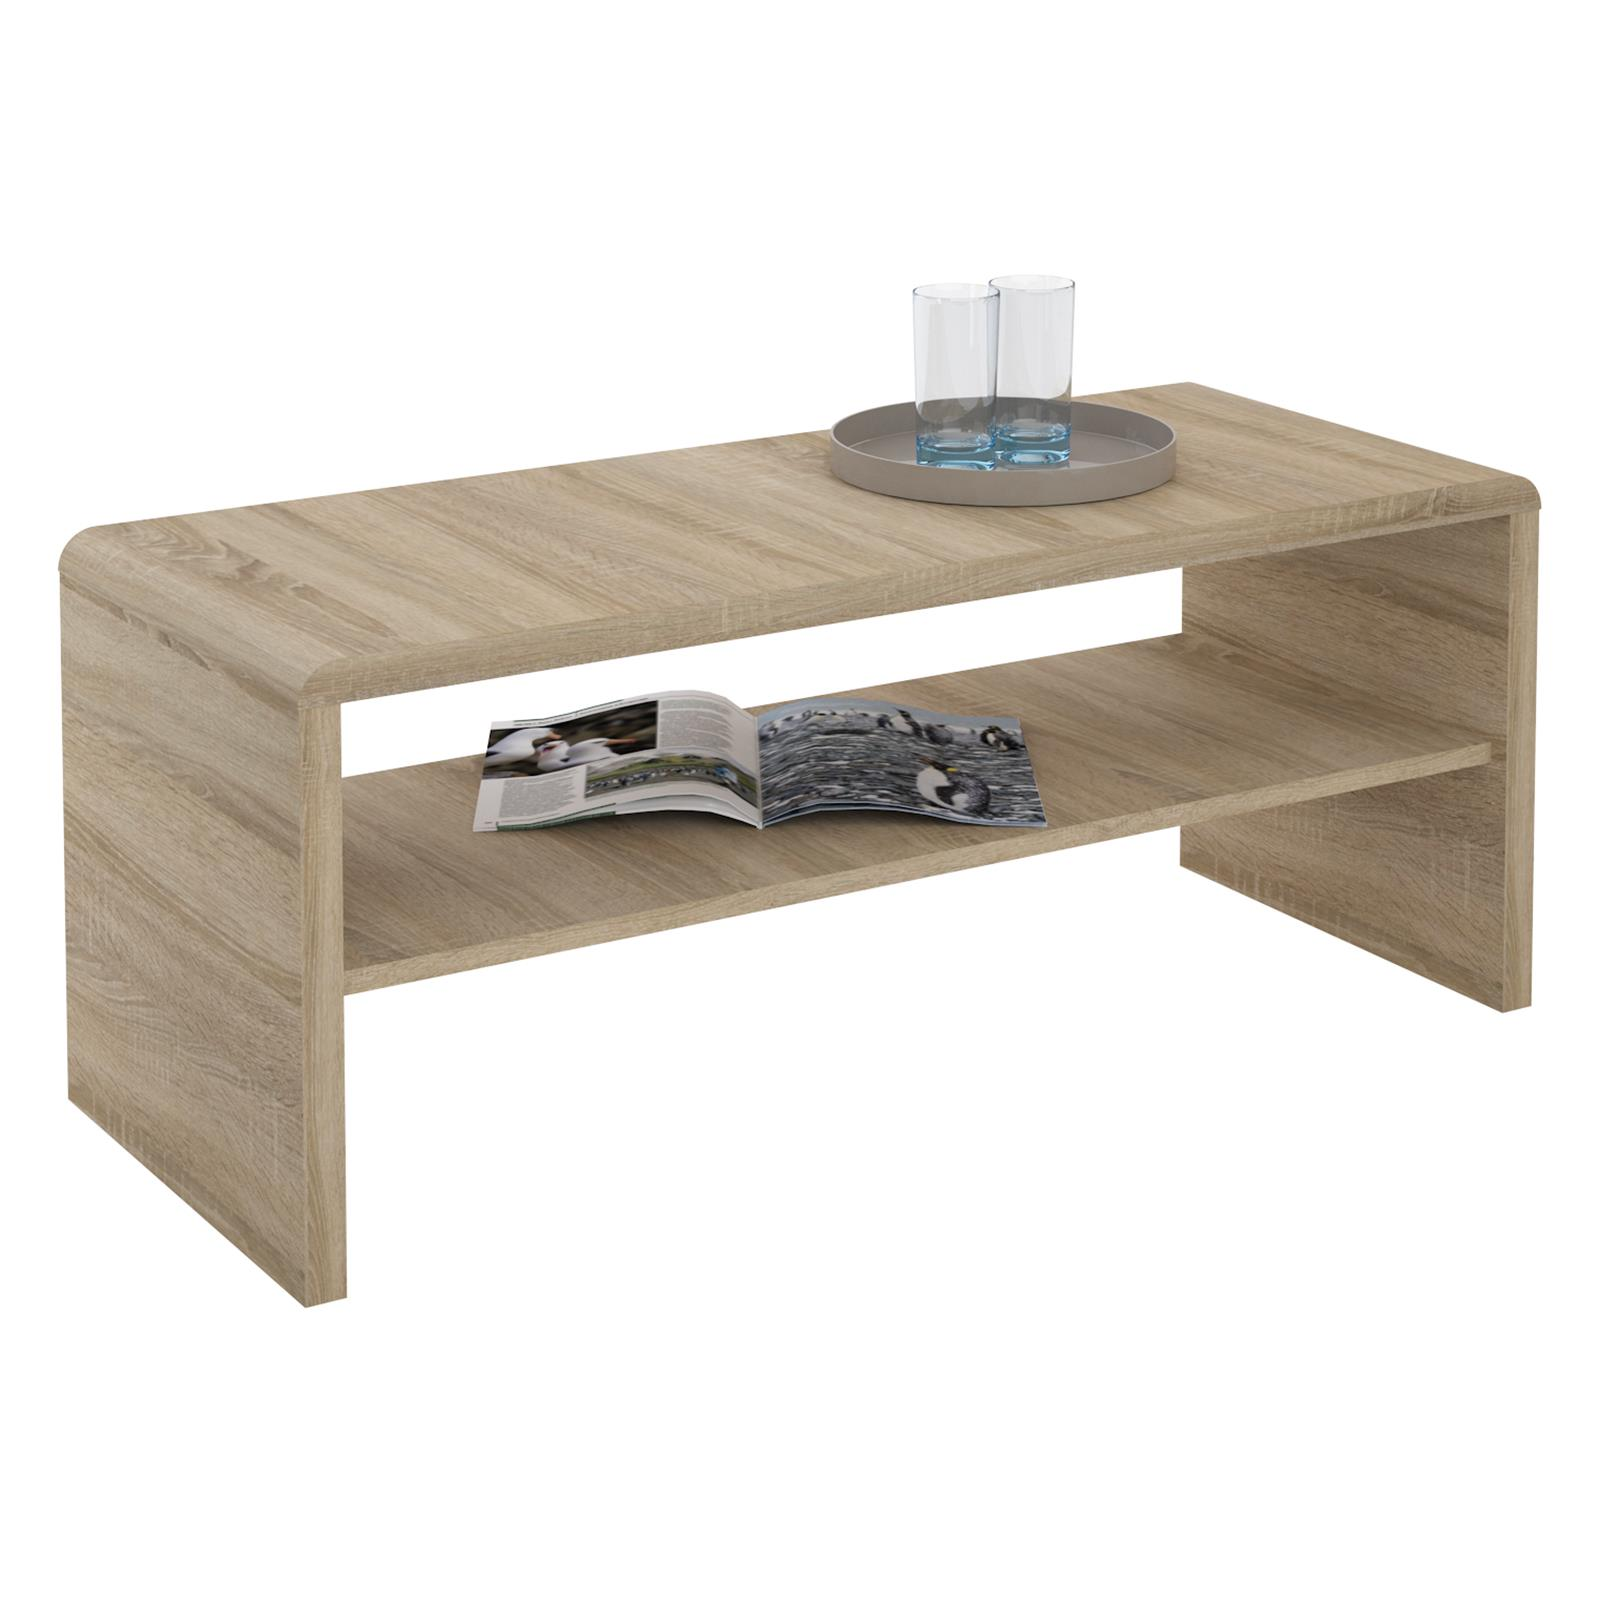 meuble tv table basse louna d cor sonoma mobil meubles. Black Bedroom Furniture Sets. Home Design Ideas